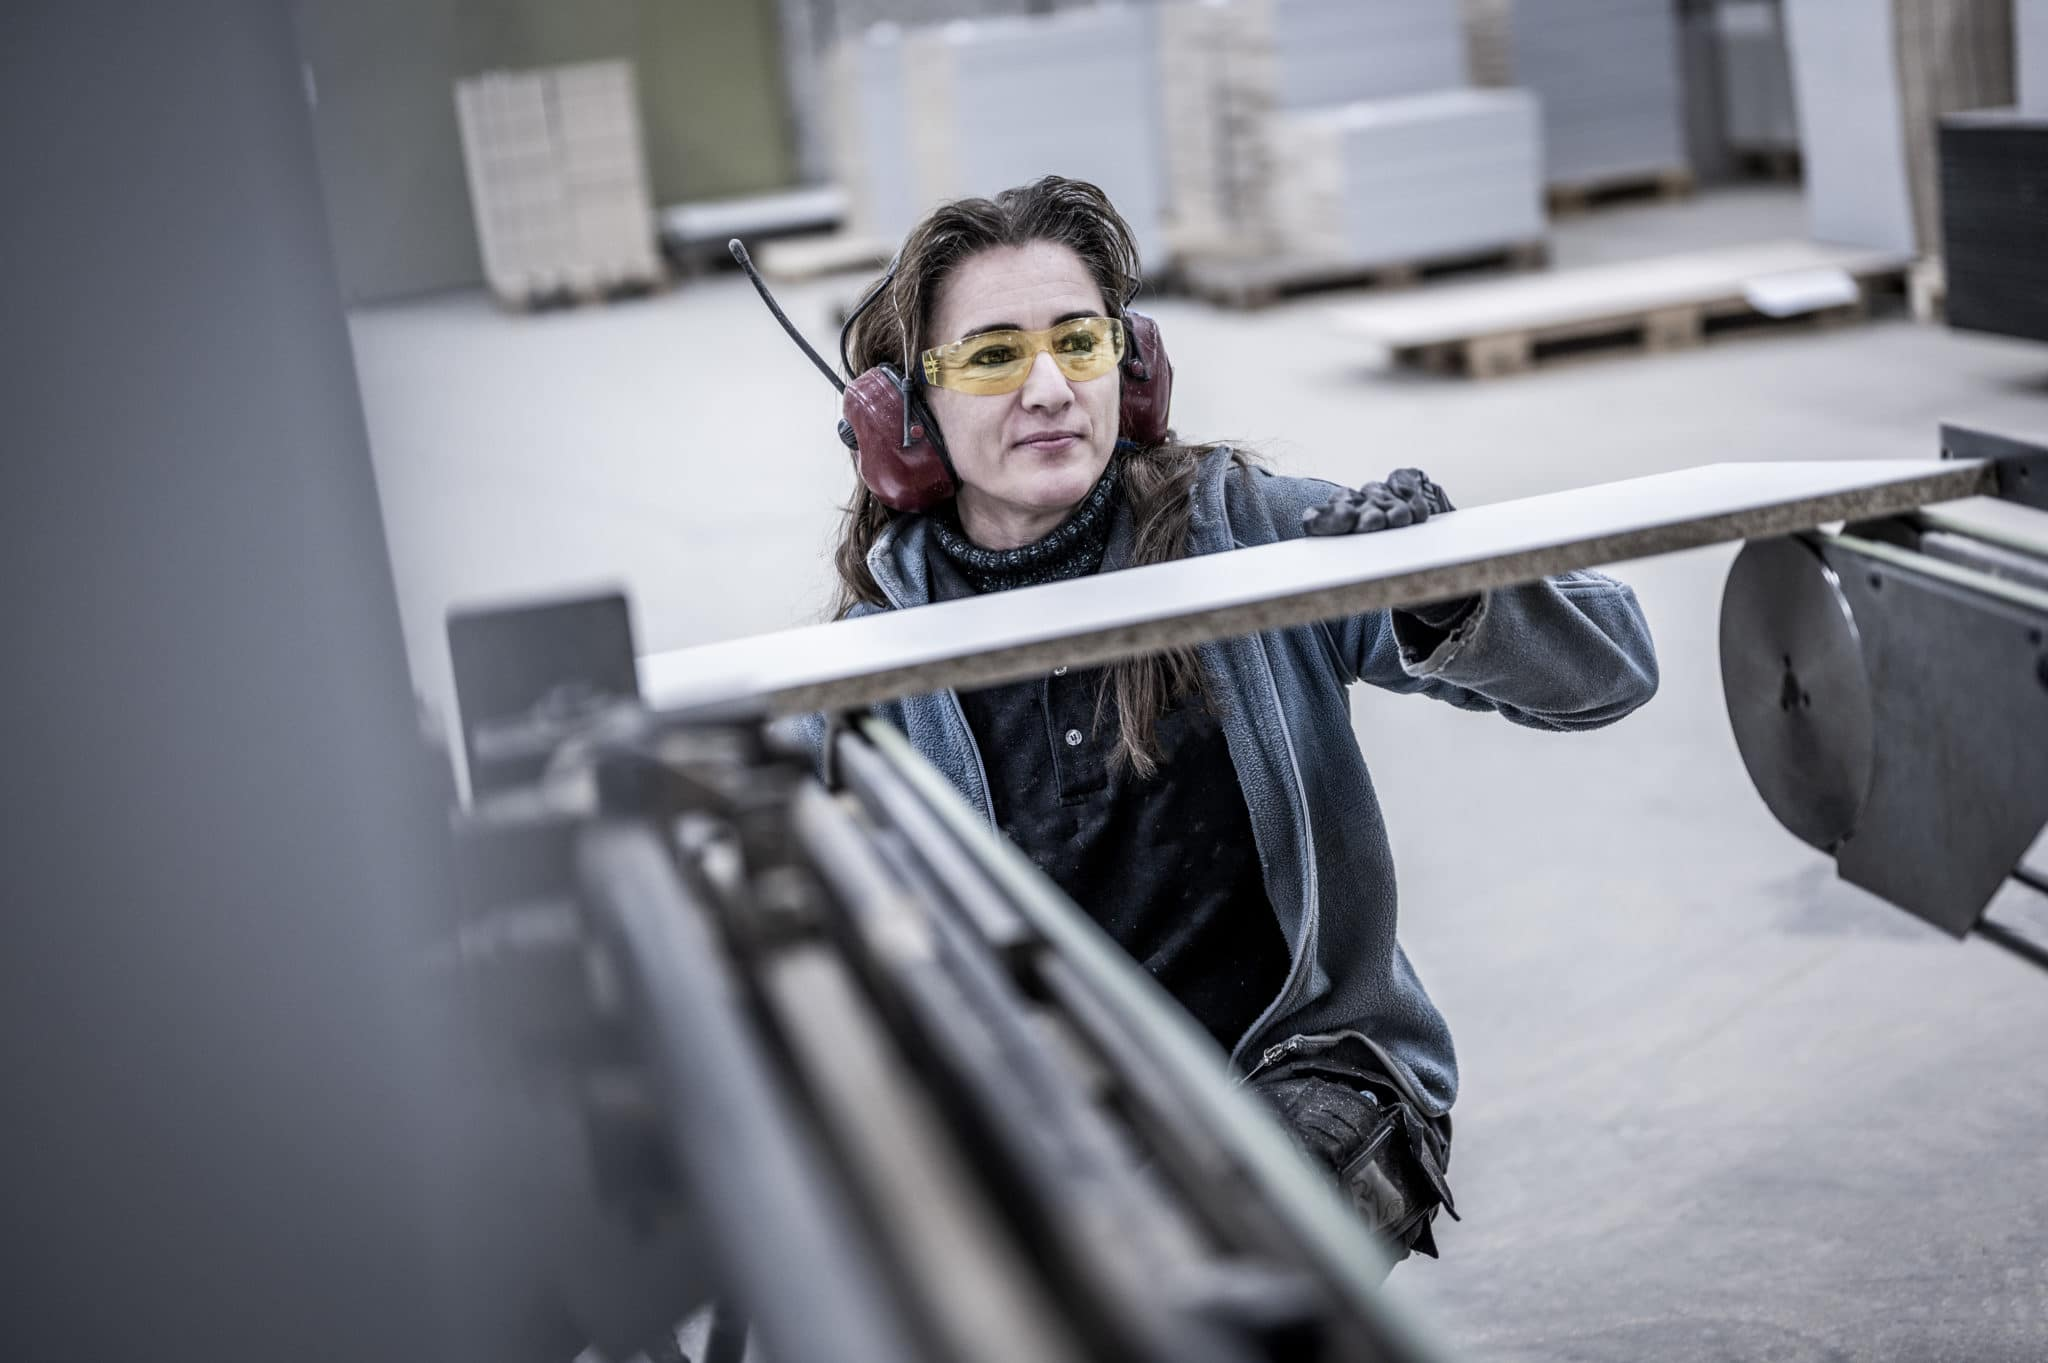 Aarsland møbelfabrikk produksjon